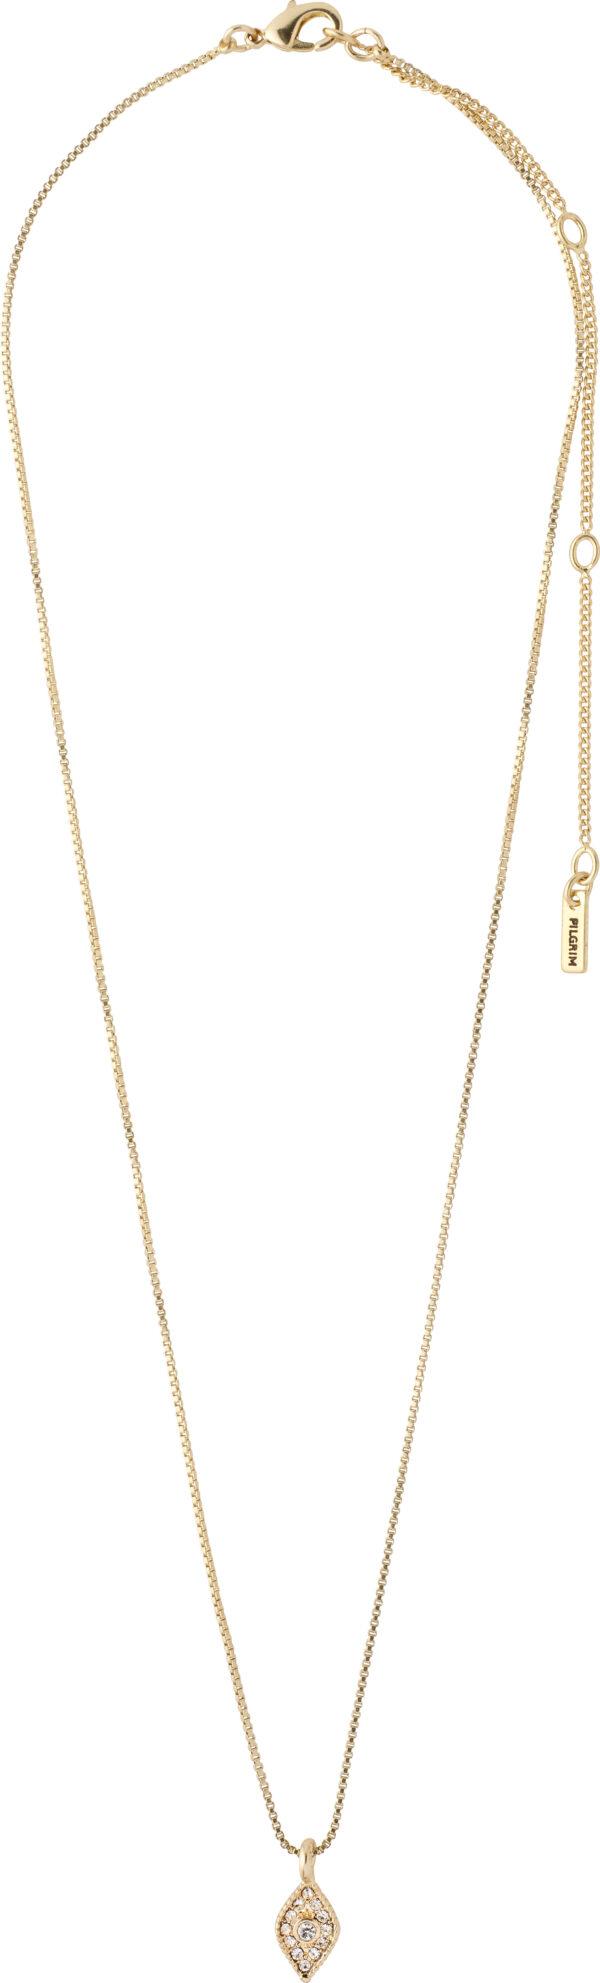 142122001 necklace sincerity gold plated crystal karma pilgrim 2